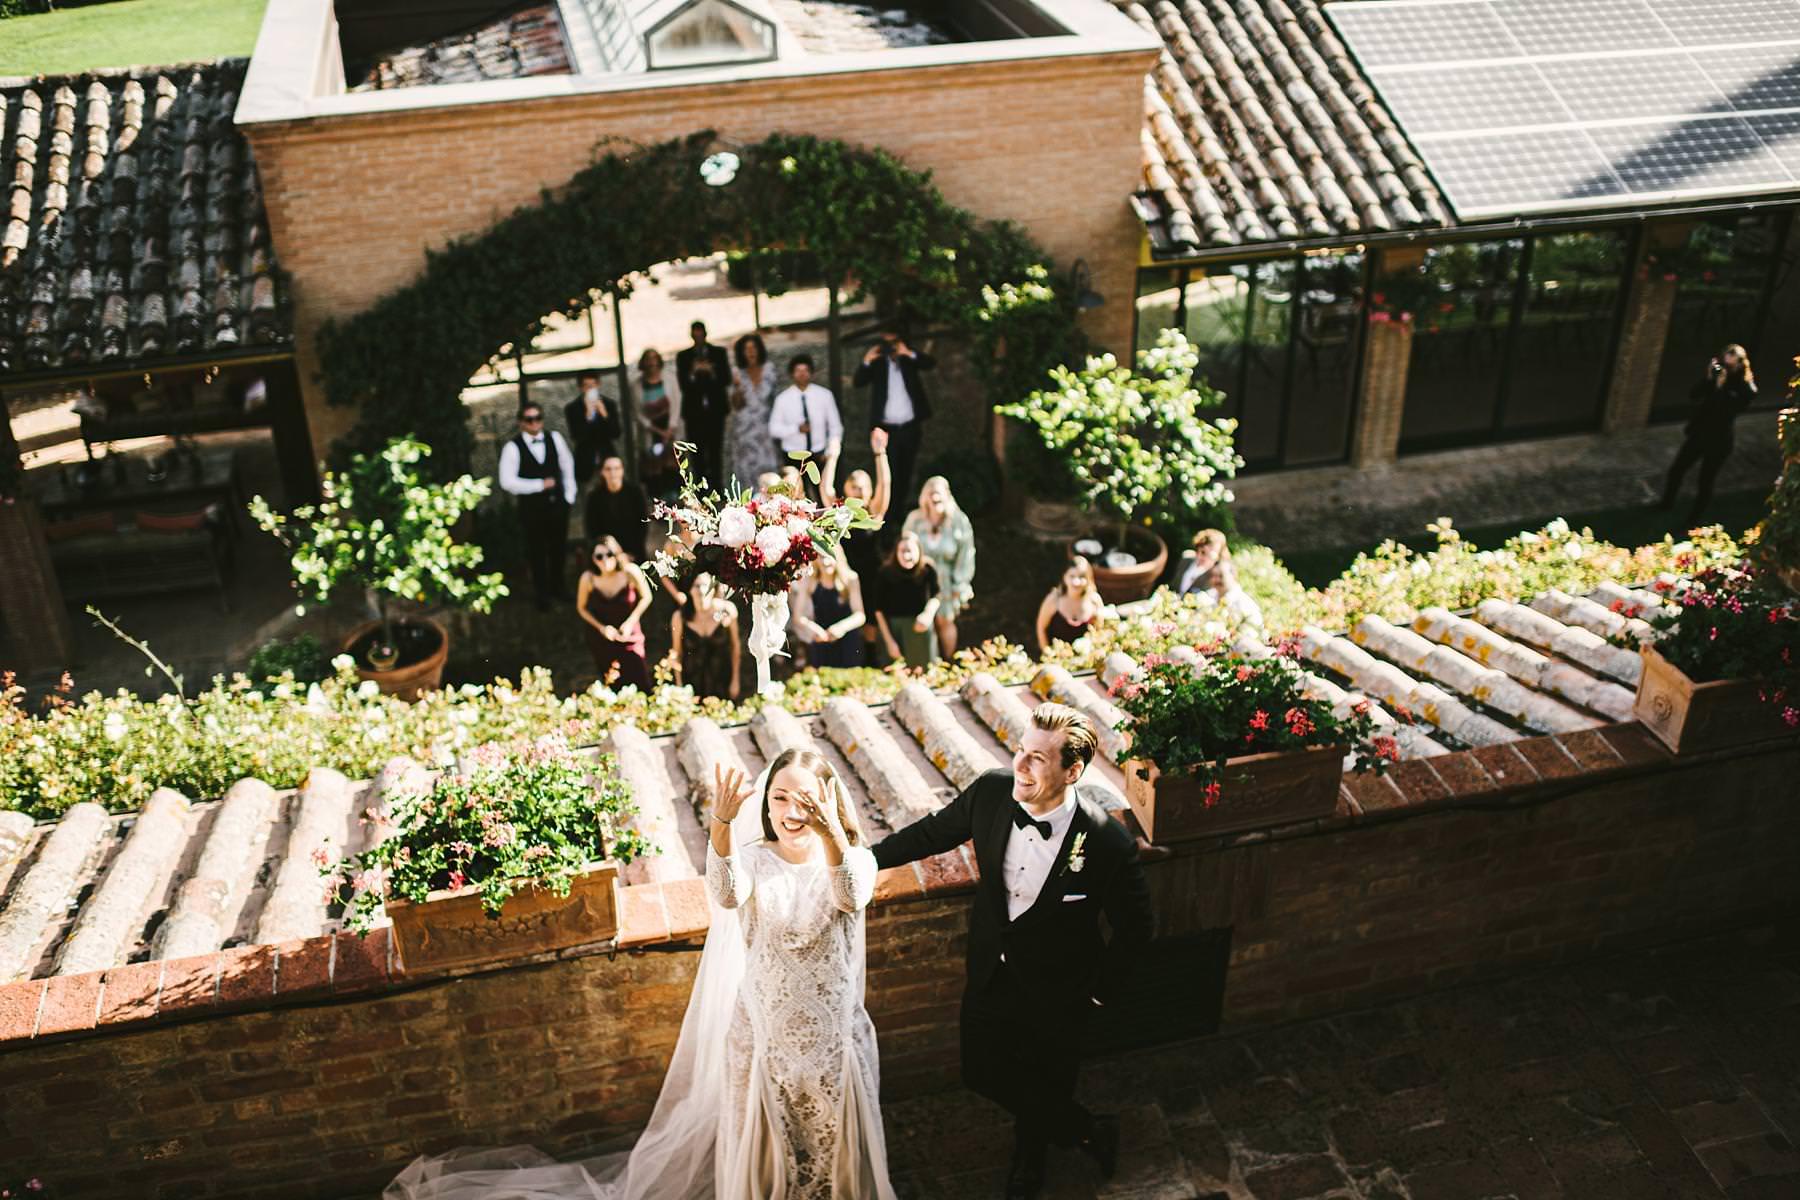 Exciting fun and elegant intimate destination wedding in Umbria at historic incredible venue Villa l'Antica Posta. Bridal bouquet toss